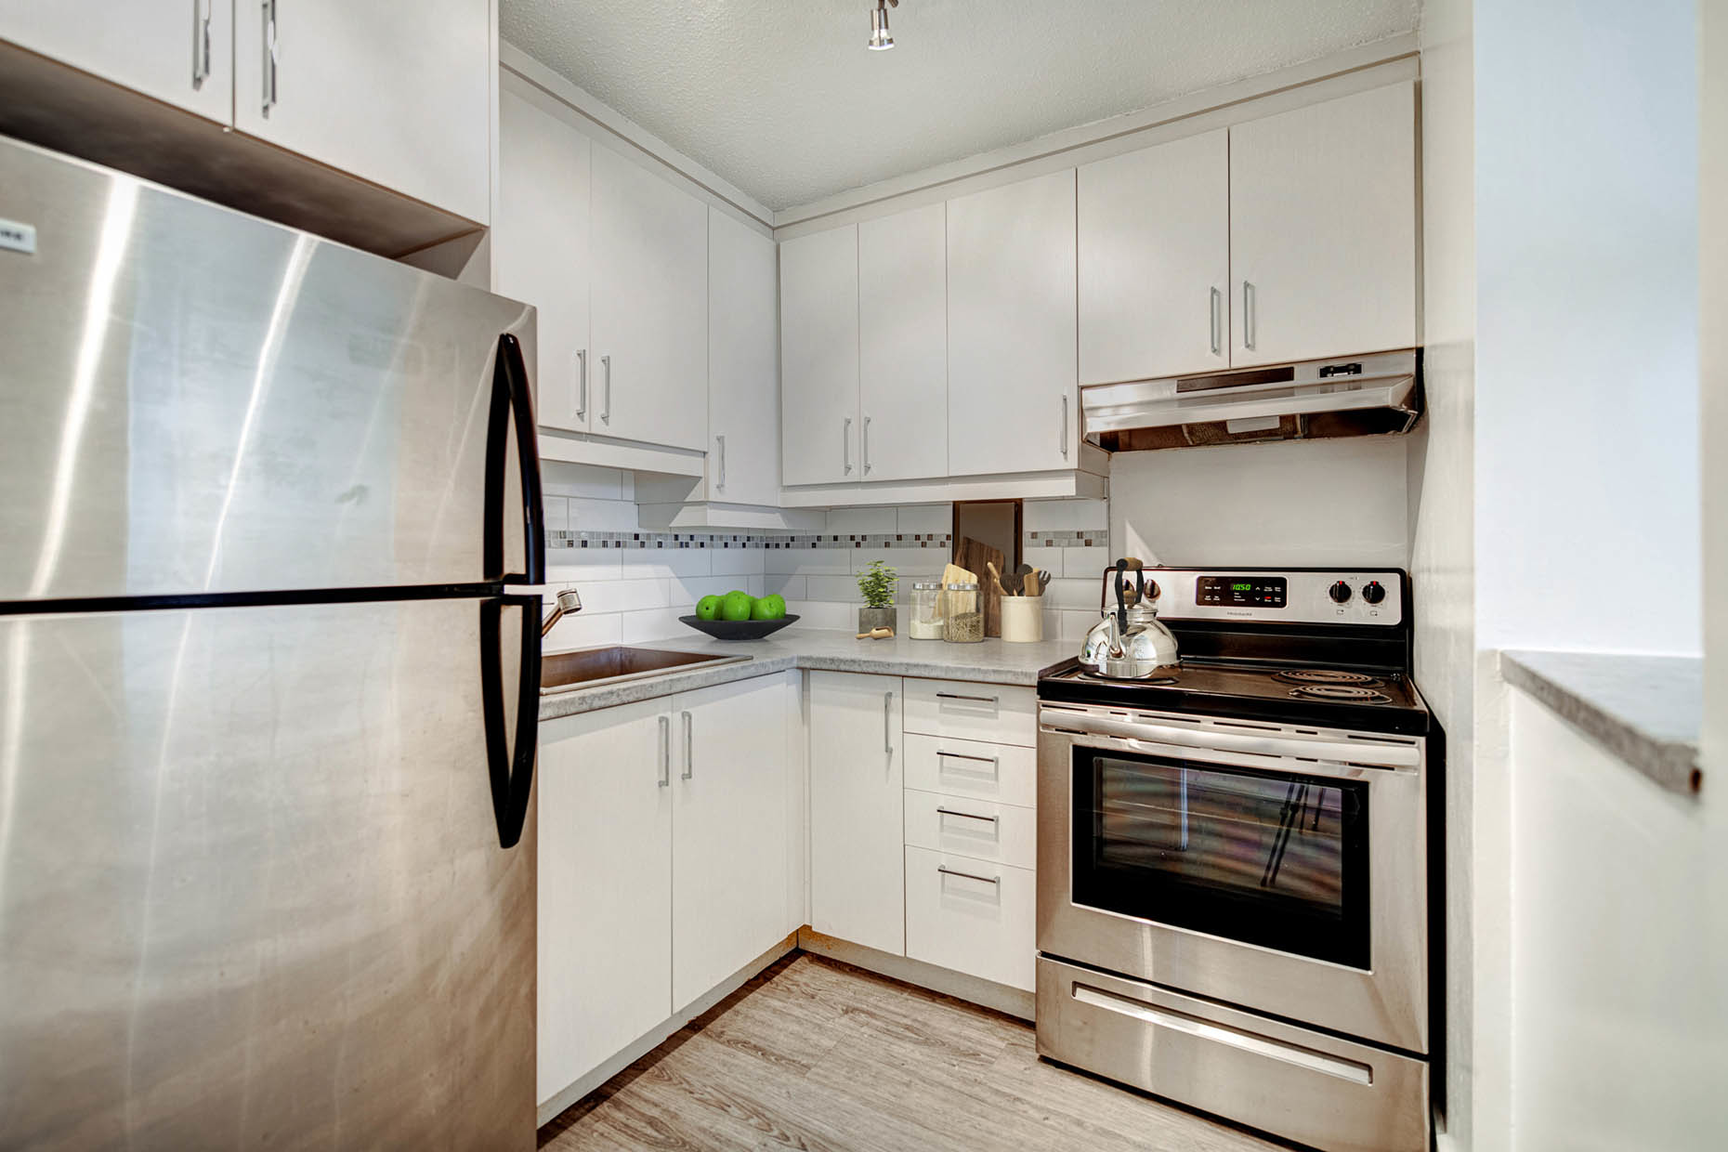 Studio / Bachelor Apartments for rent in Nuns' Island at Hi-Rise 4 - Photo 03 - RentQuebecApartments – L407154